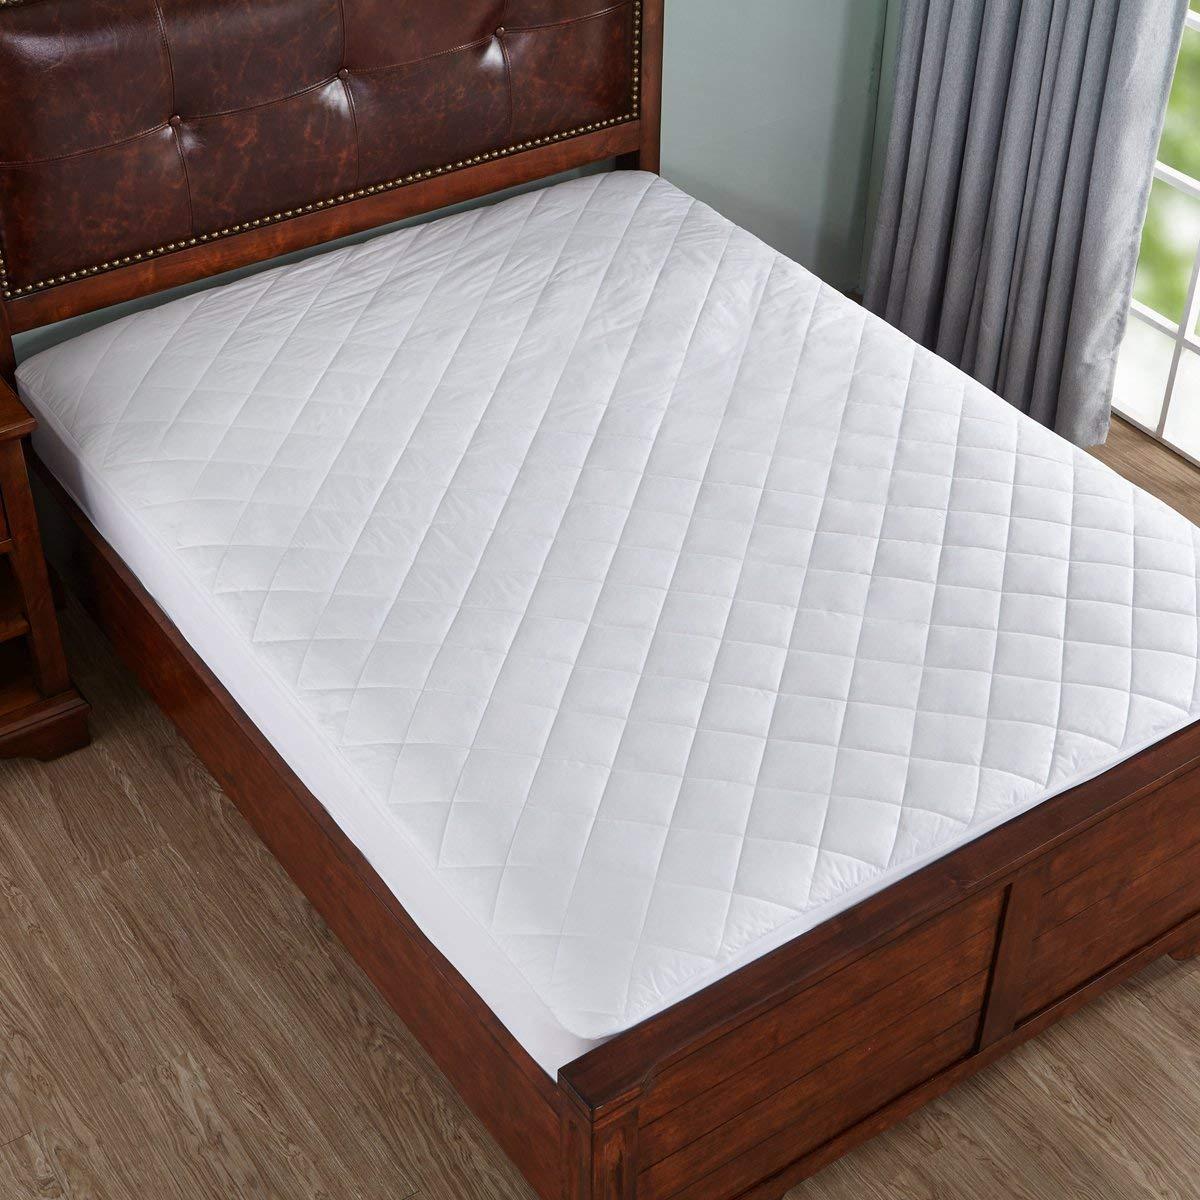 Amazon Com Home Elements Waterproof Cotton Mattress Pad King Size